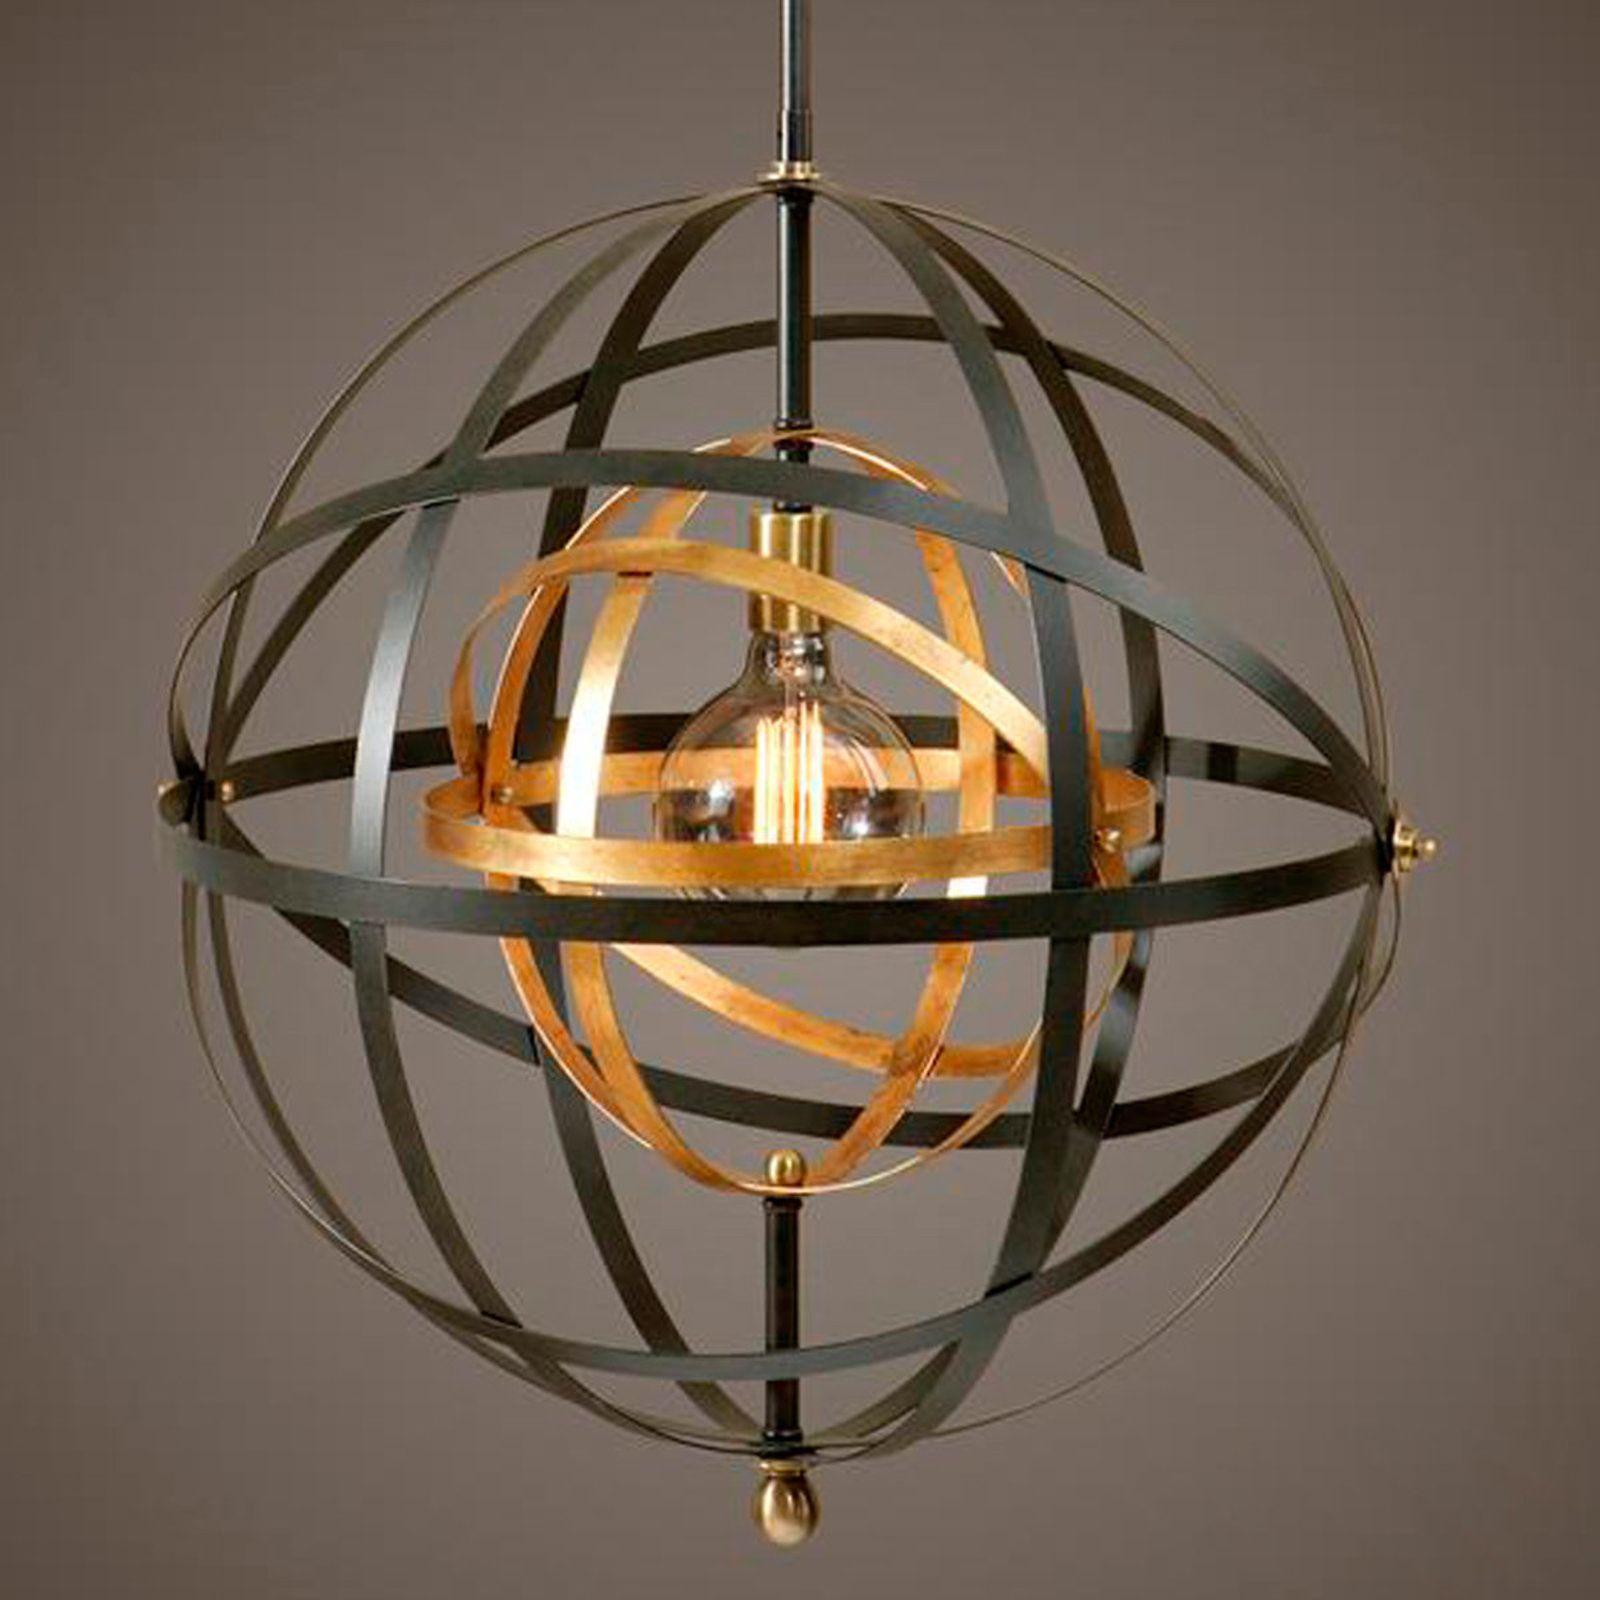 Image Result For Two Tone Orb Light Chandelier Pendant Lighting